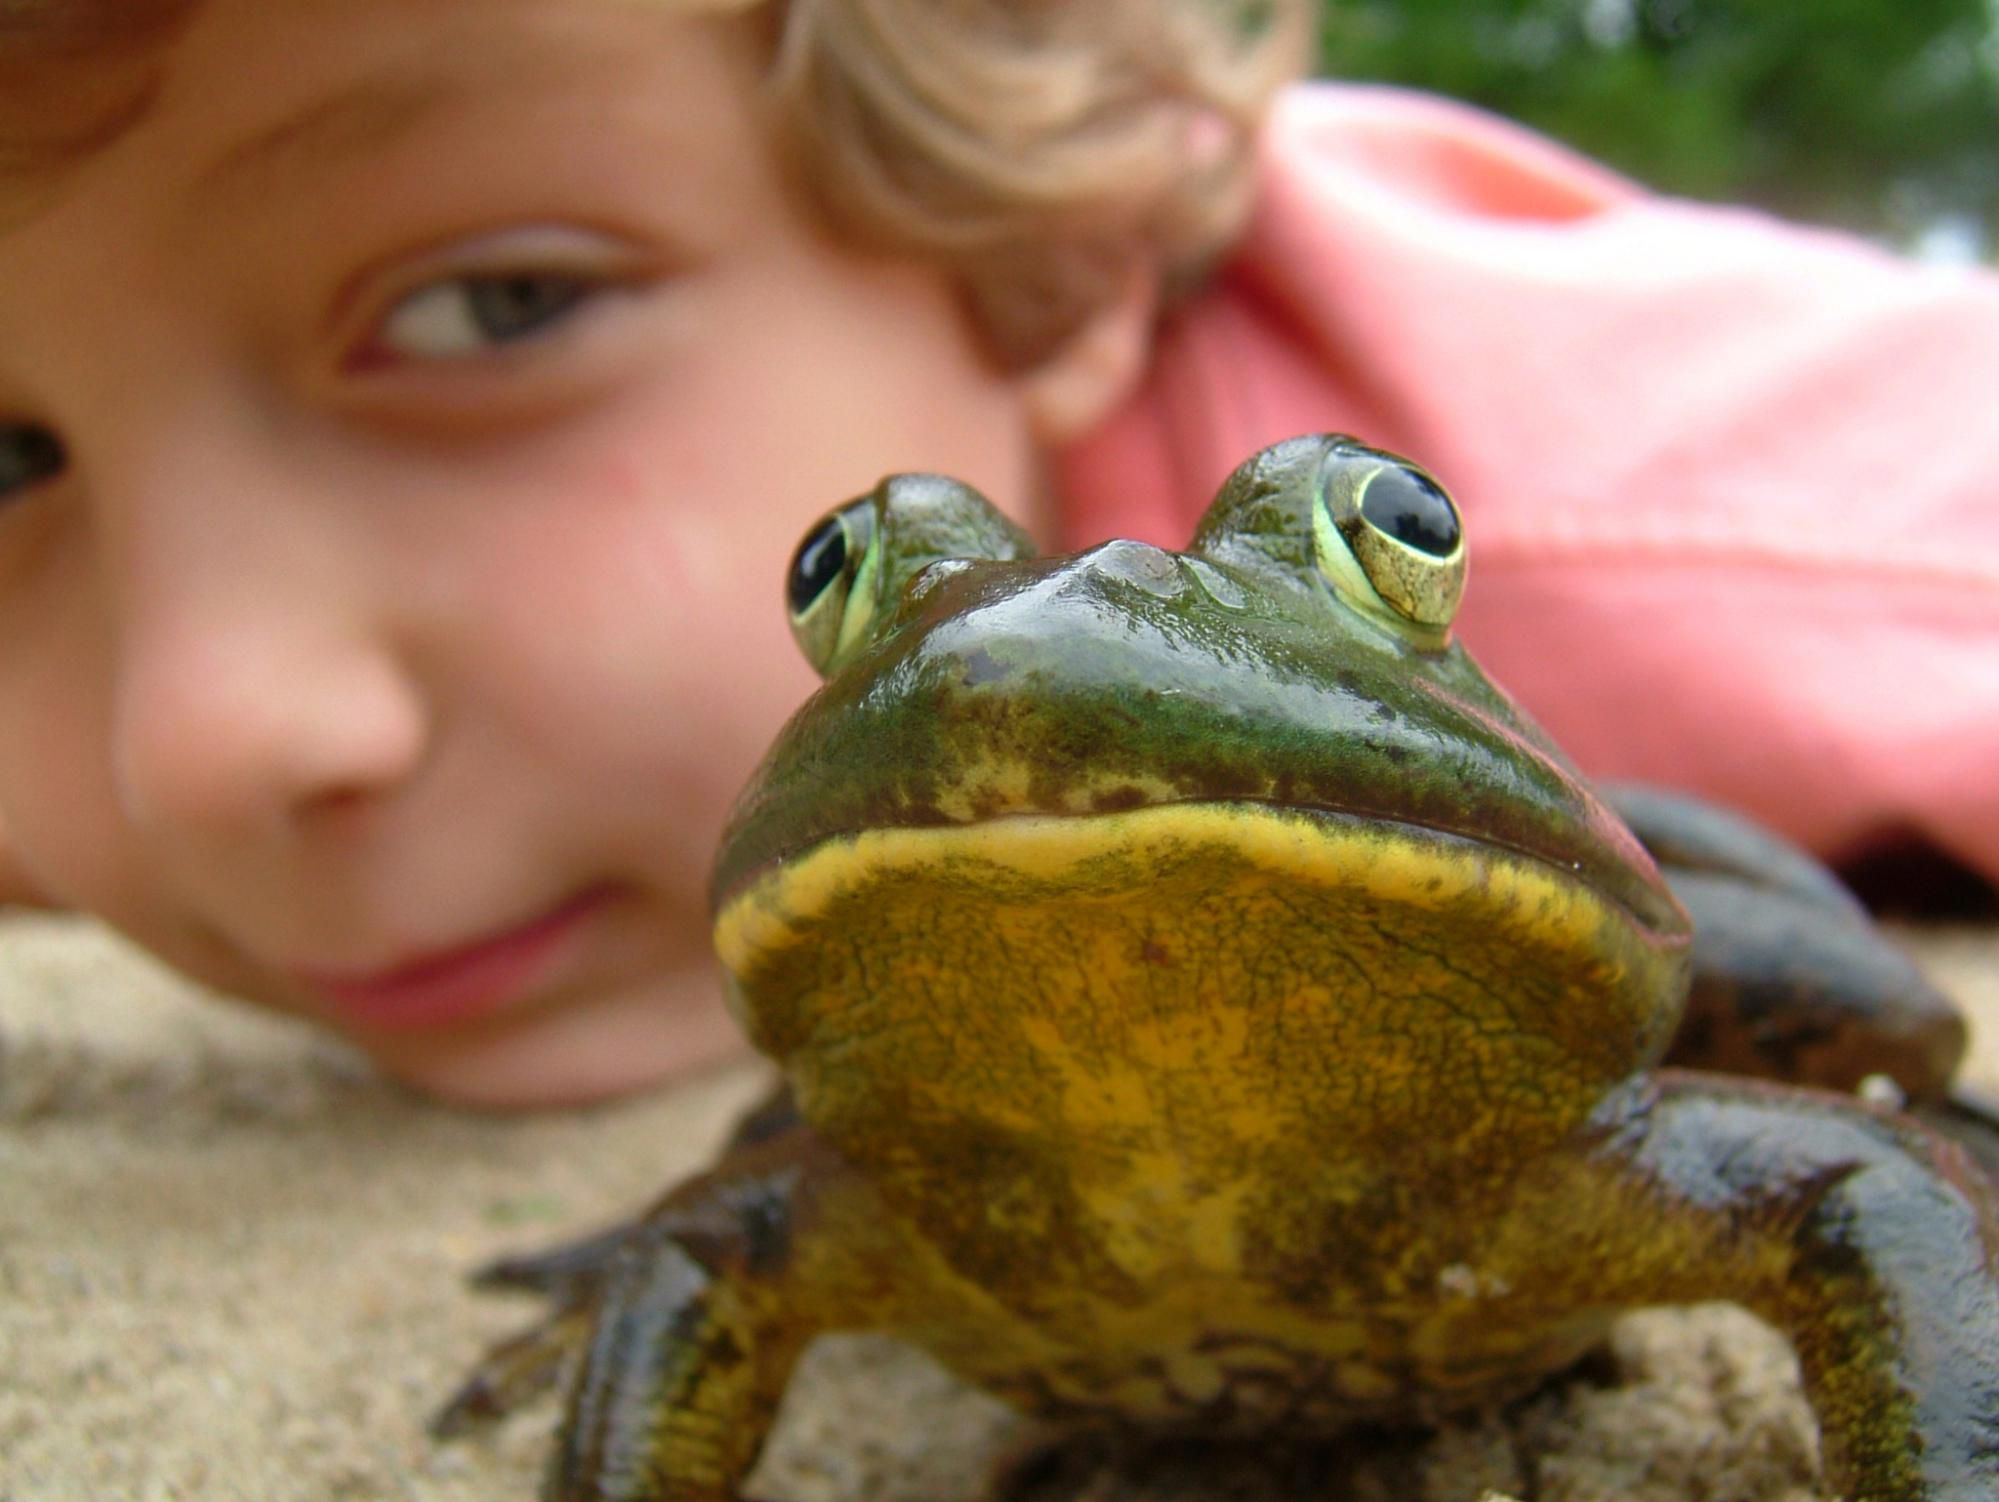 Frog Anatomy - Internal and External